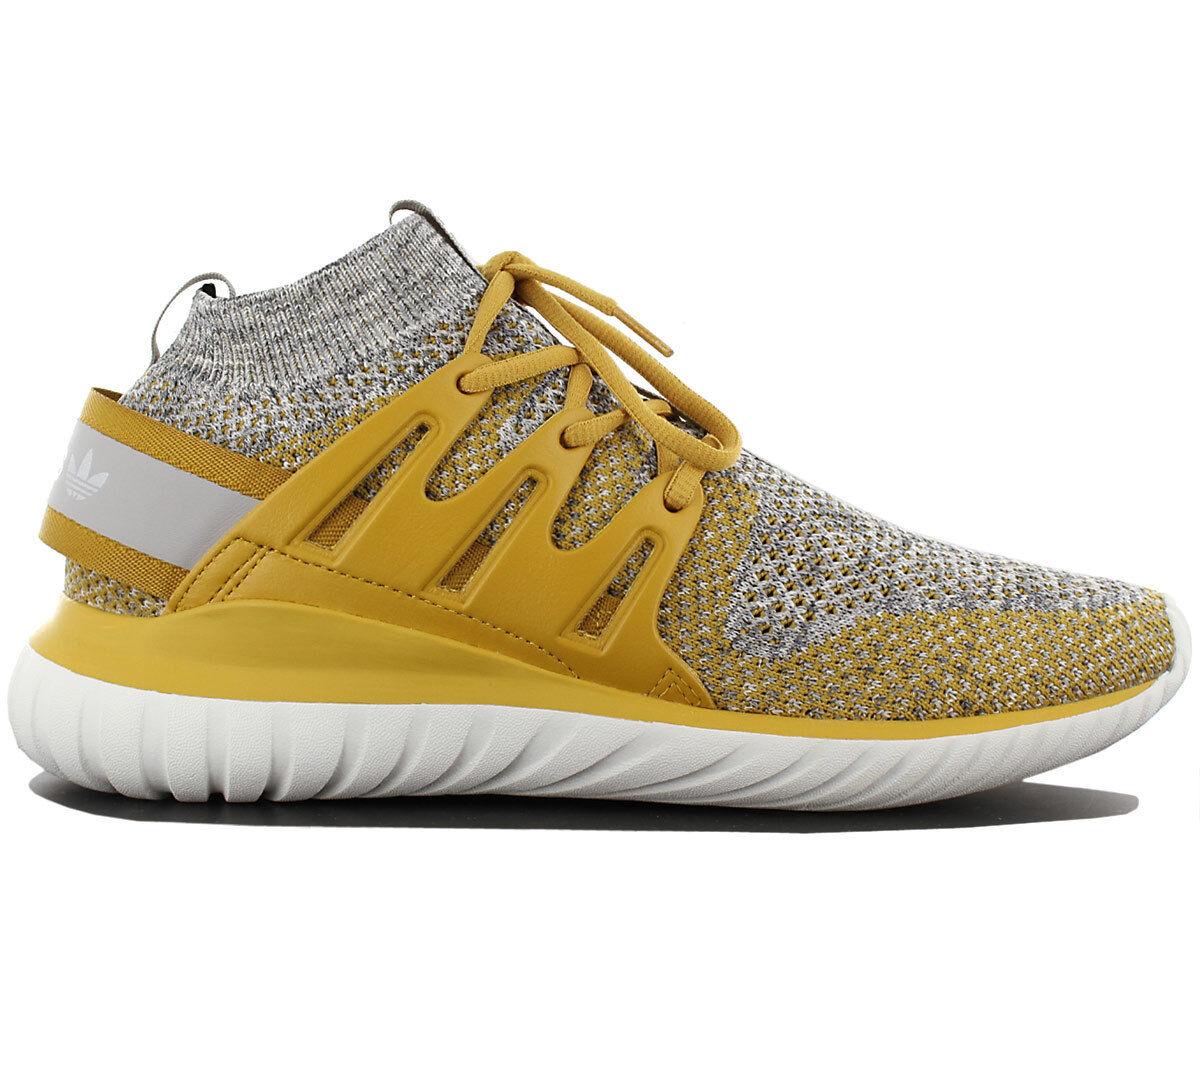 Adidas Originals tubular Nova PK PK PK primeknit cortos zapatos casual marca de zapatillas nuevo e96582